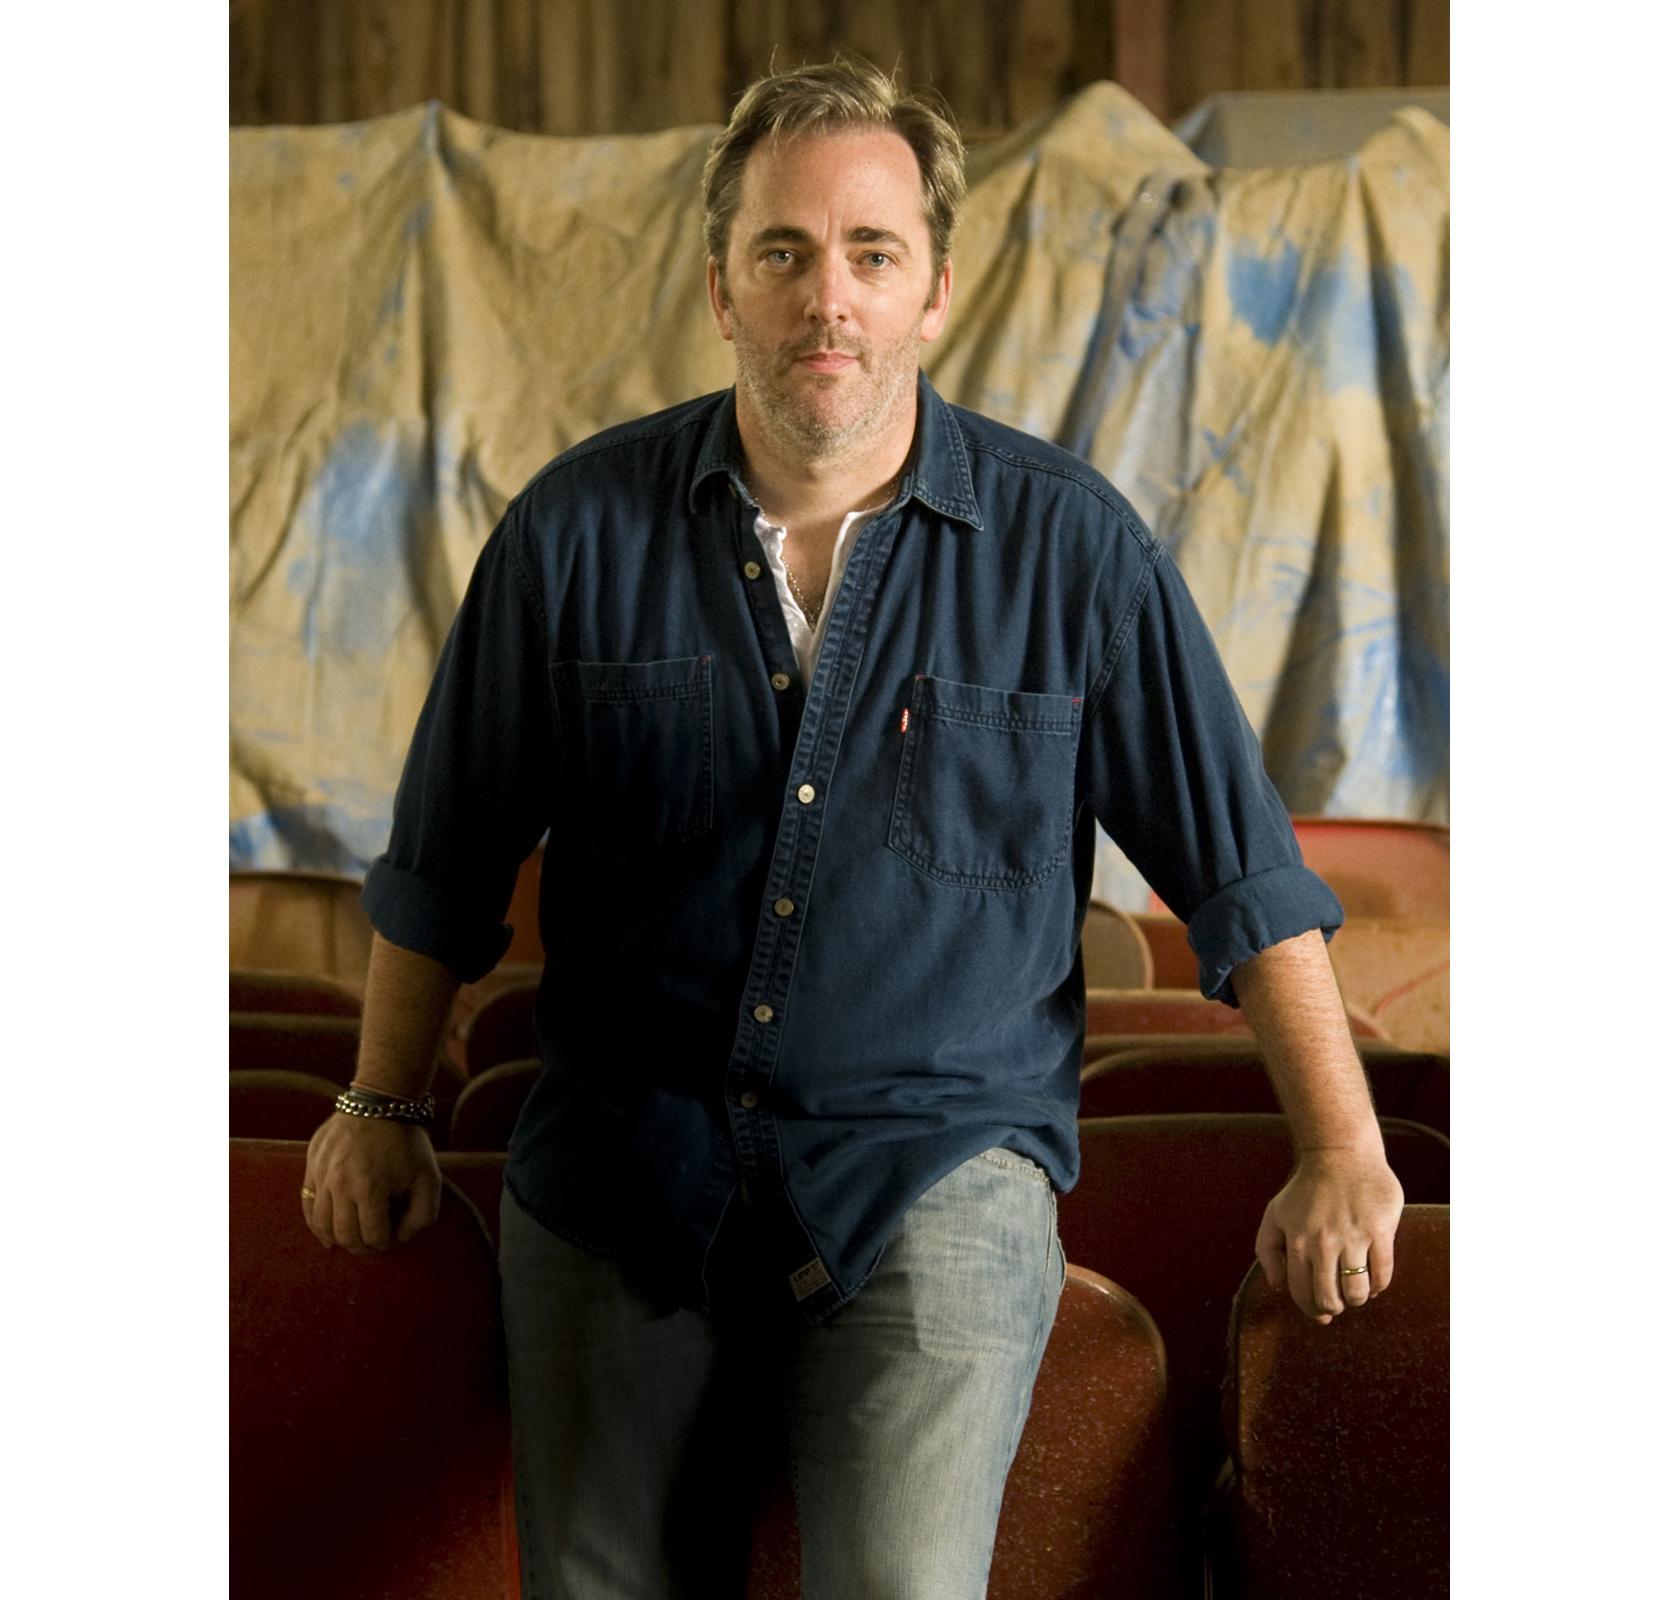 Michaelportrait0194.JPG